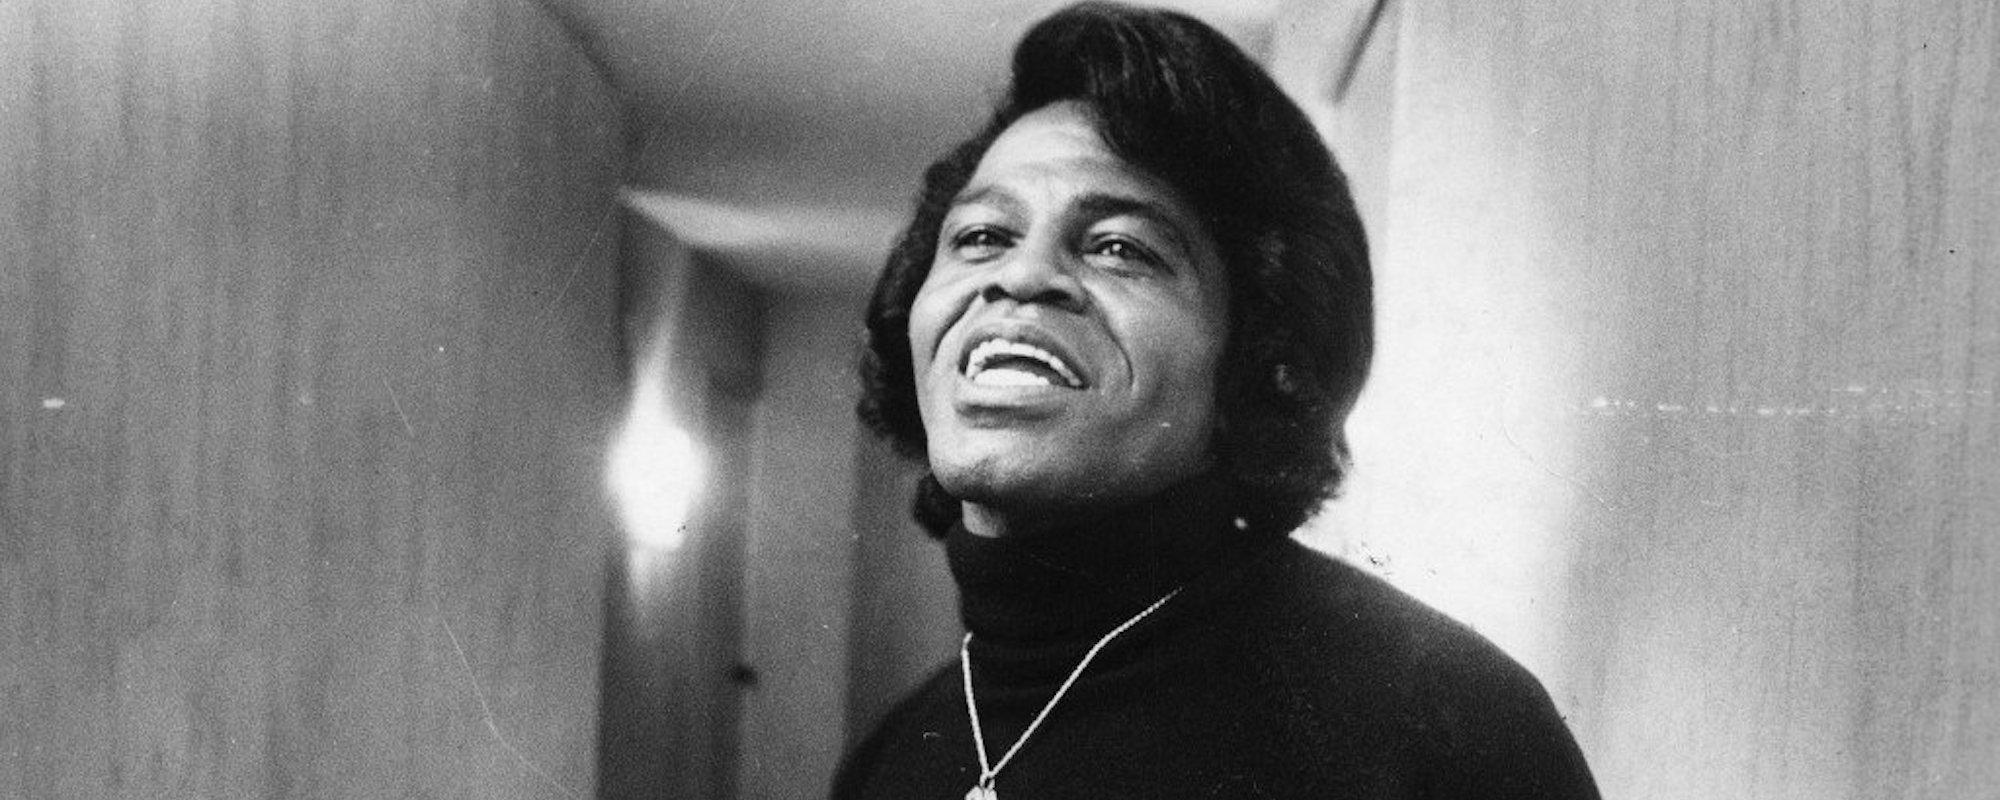 James Brown Smiling